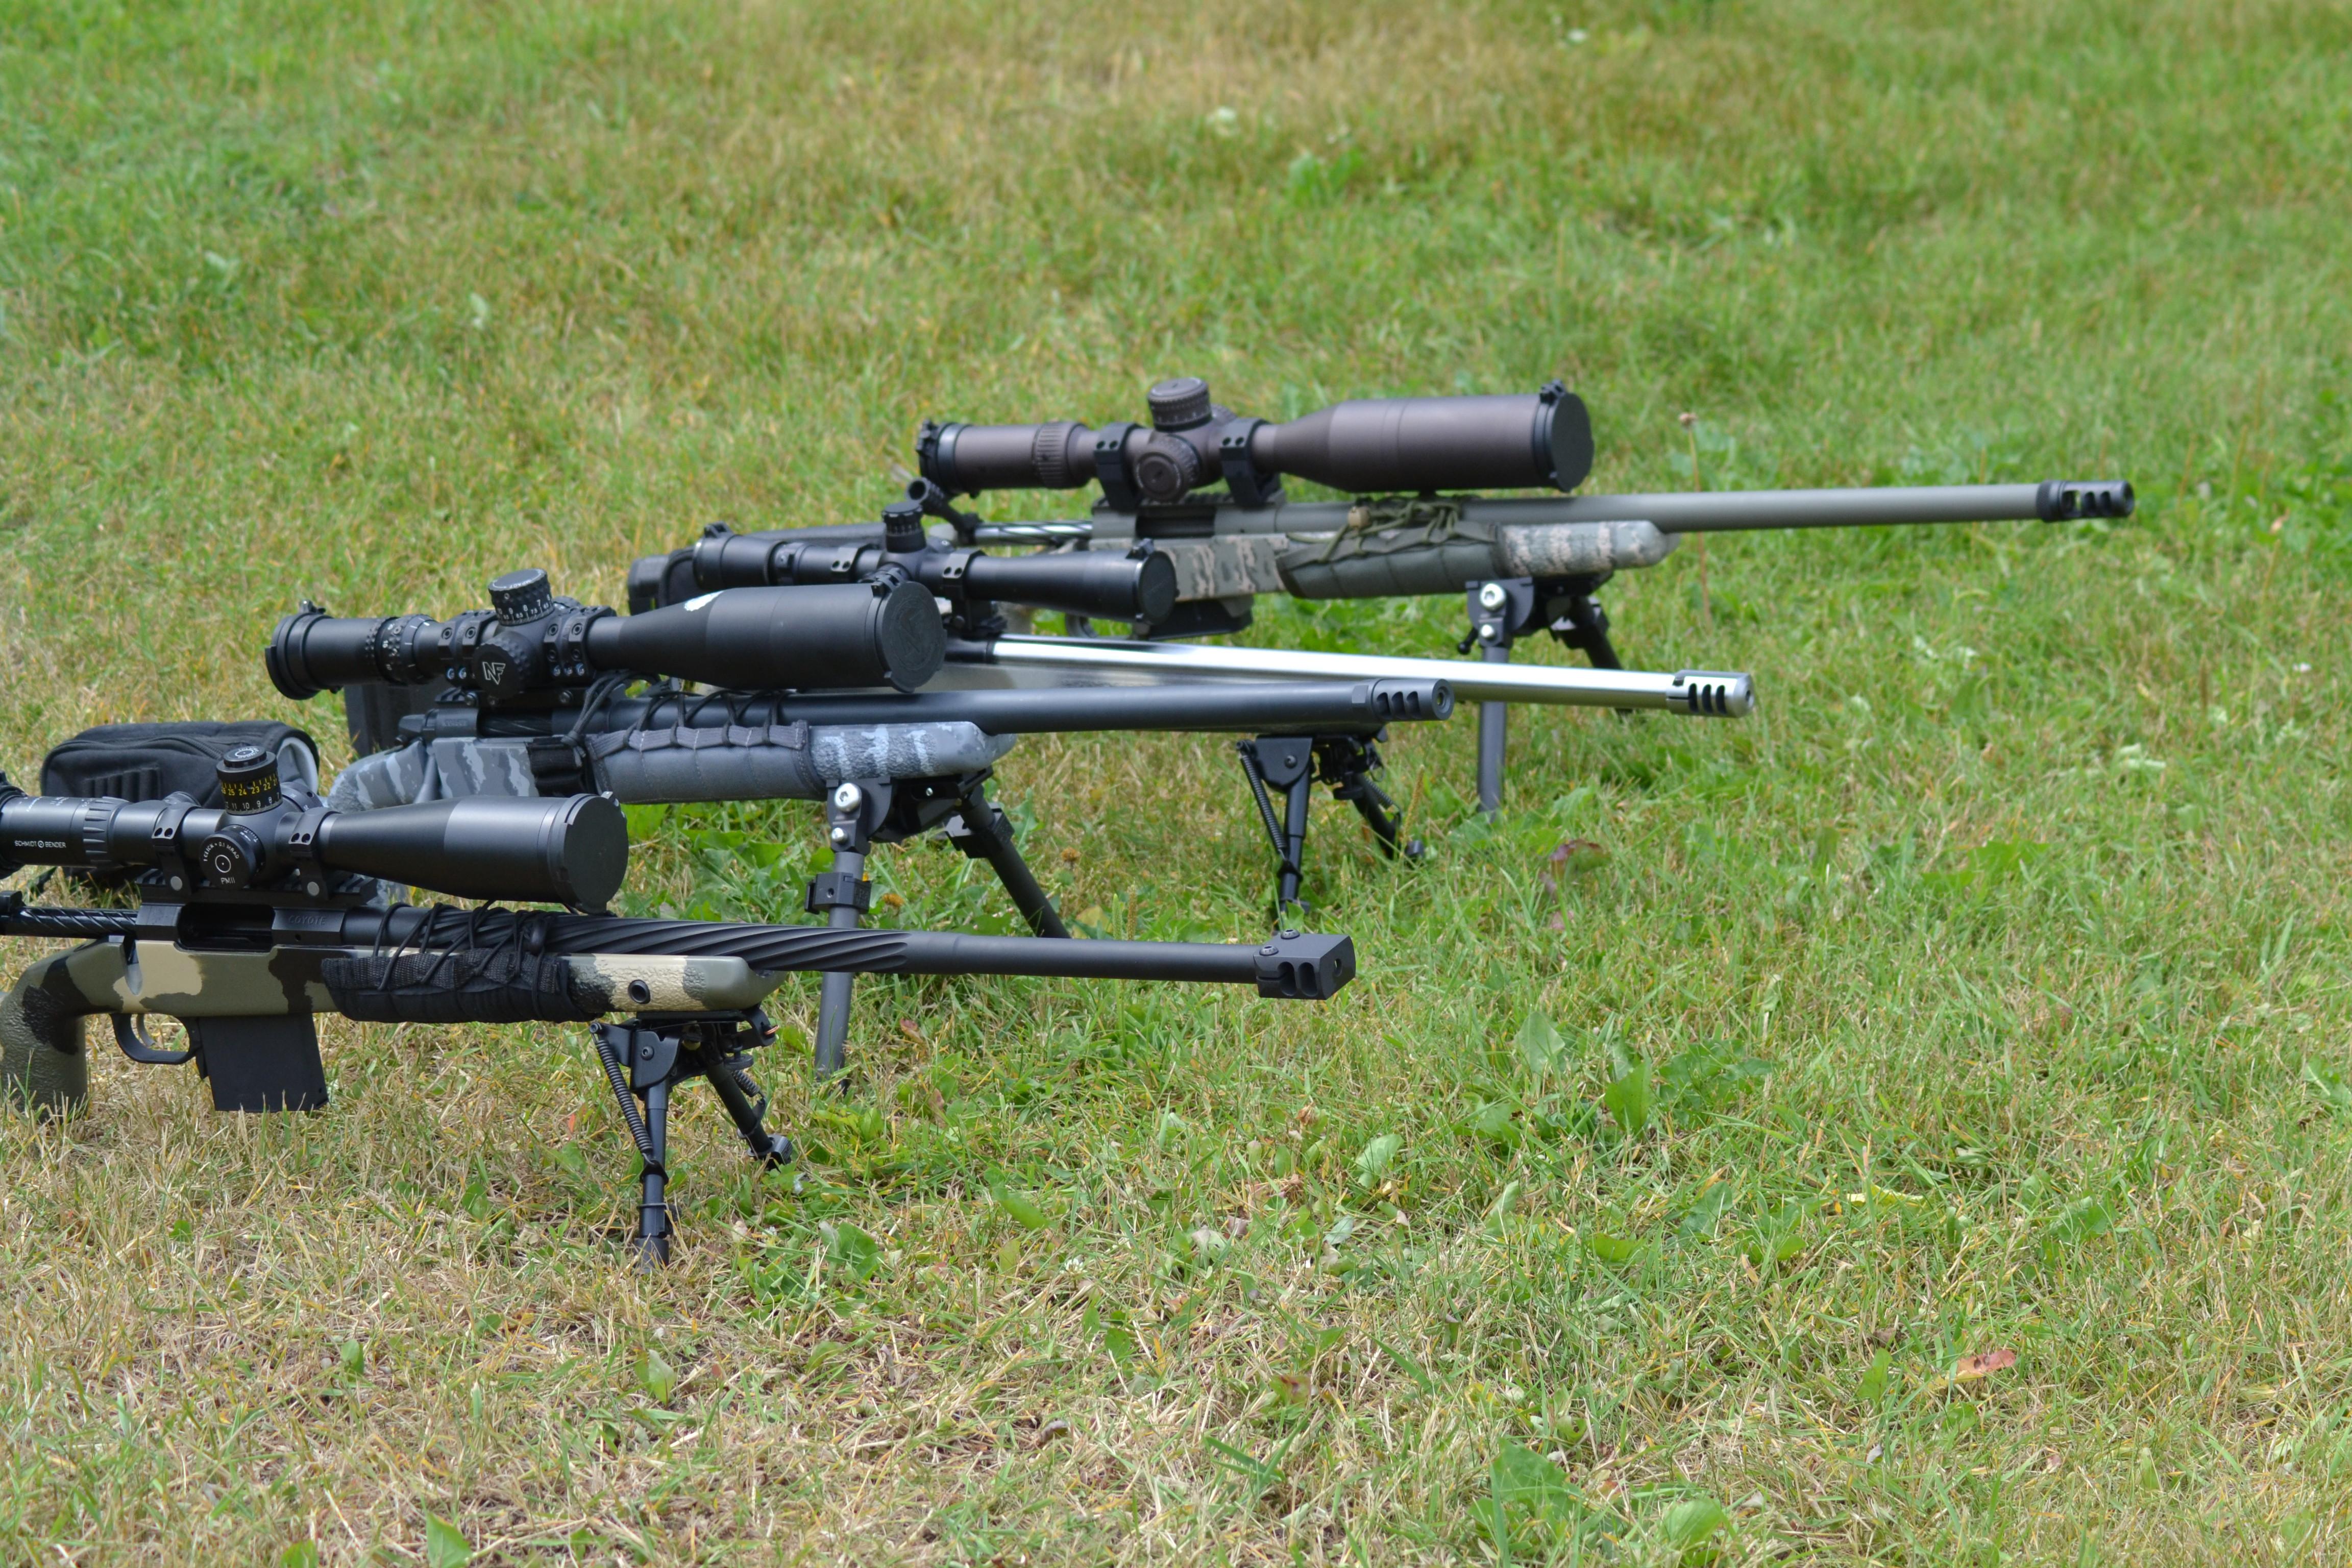 Muzzle Brakes – Canadian Made Insite Arms 'Heathen' vs